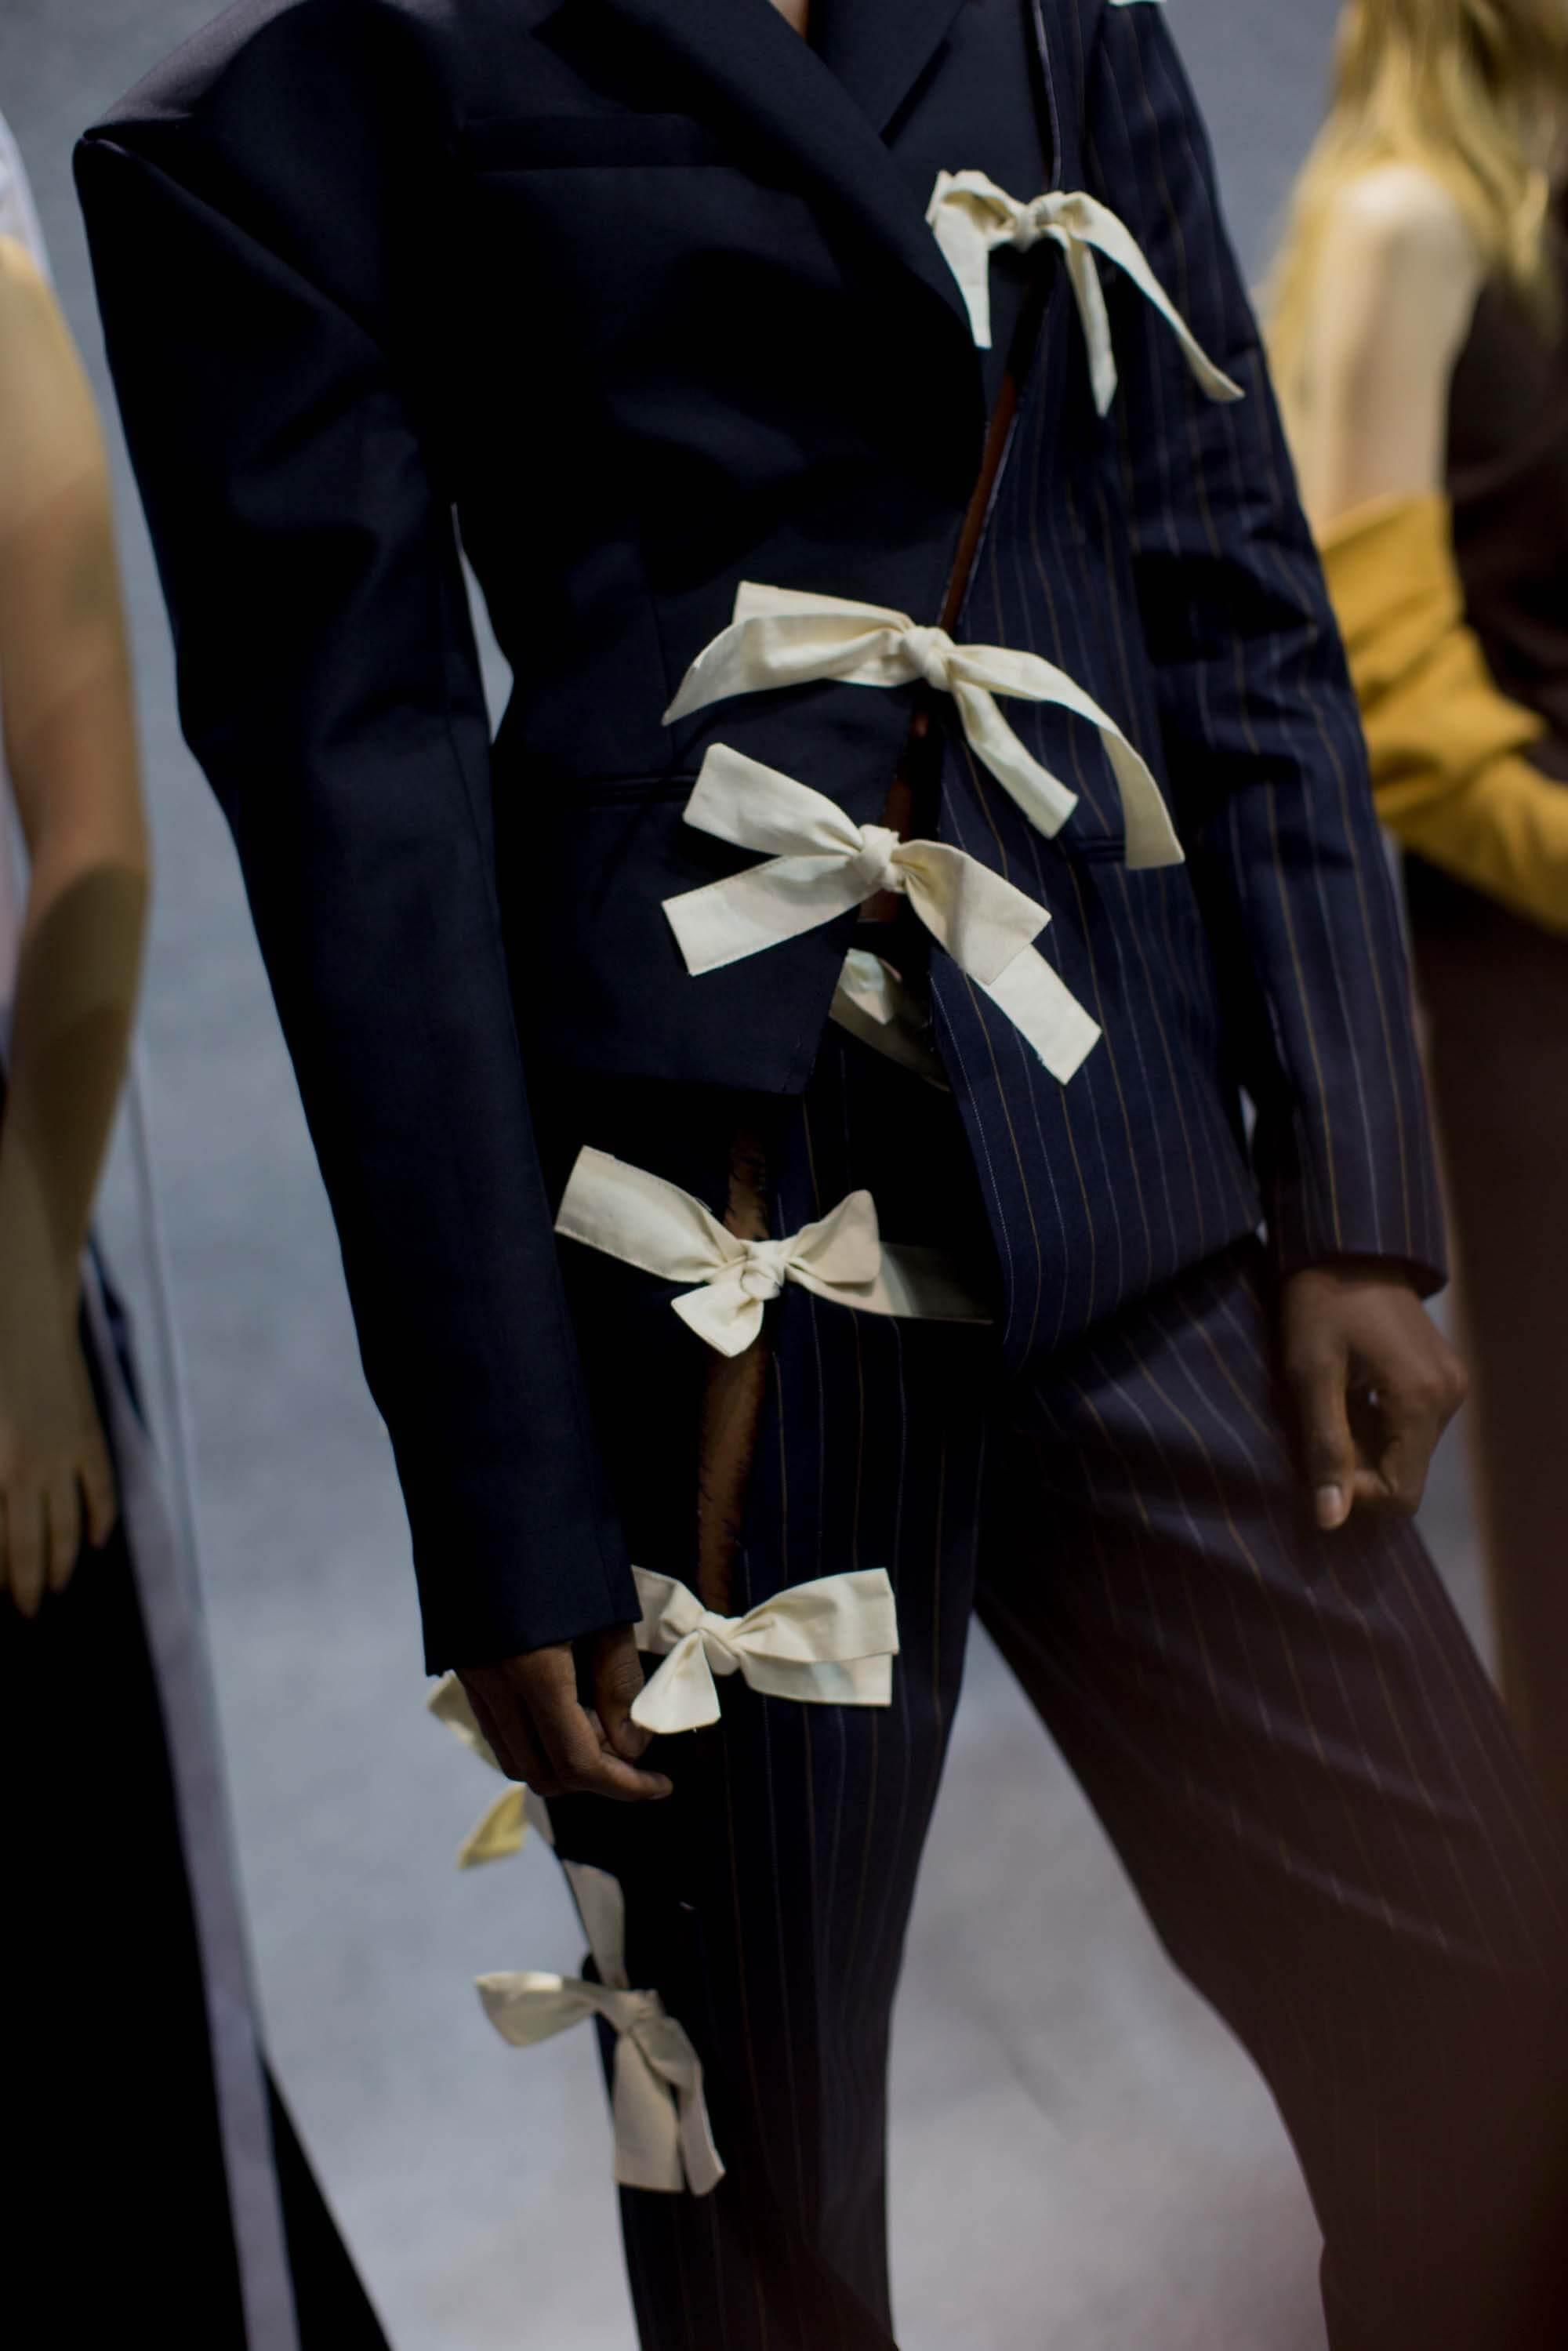 Bows trend Paris Fashion Week 2016 Kevin Tachman